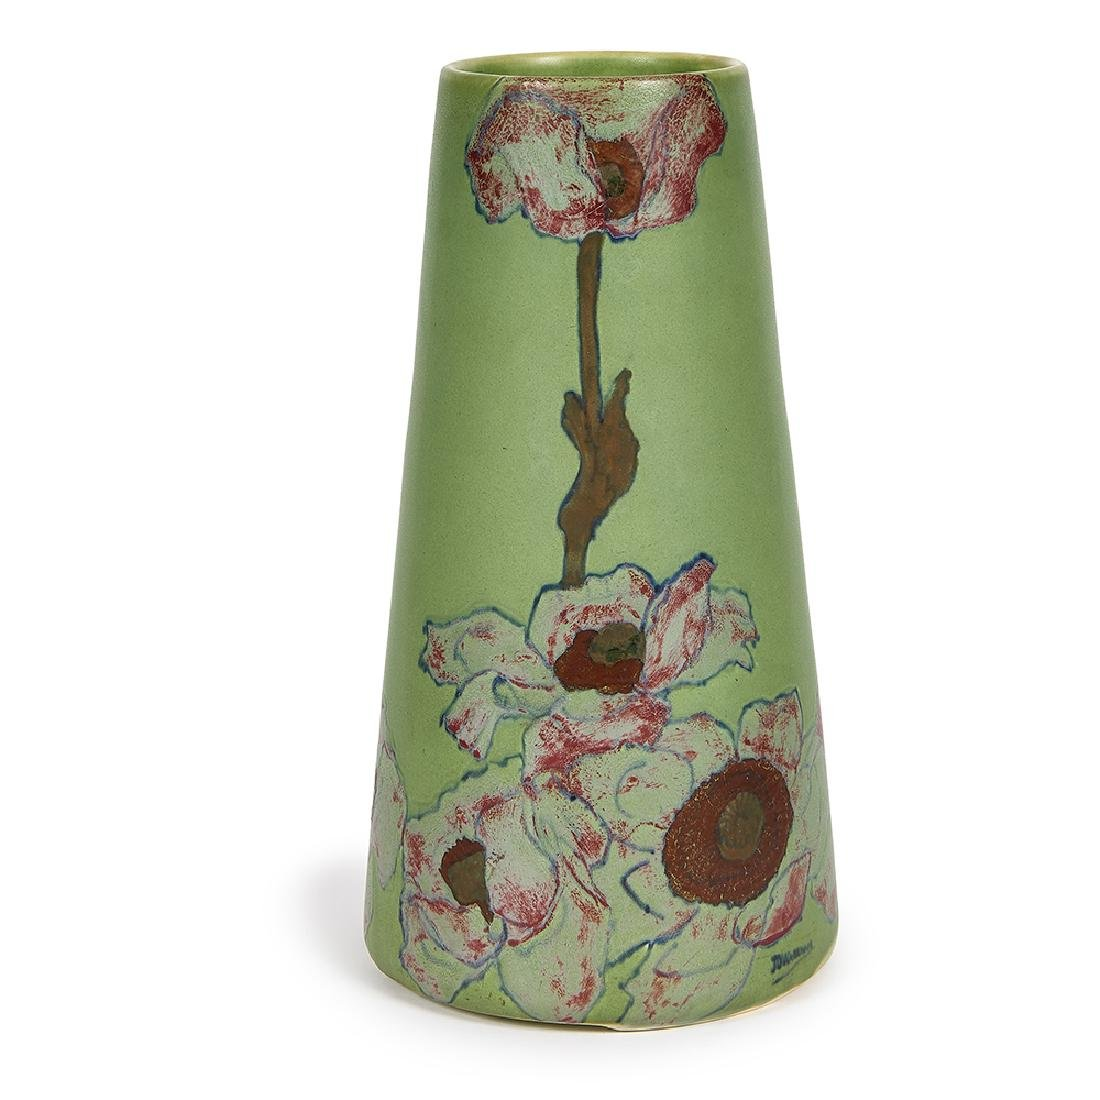 John Wareham for Rookwood Pottery lamp base